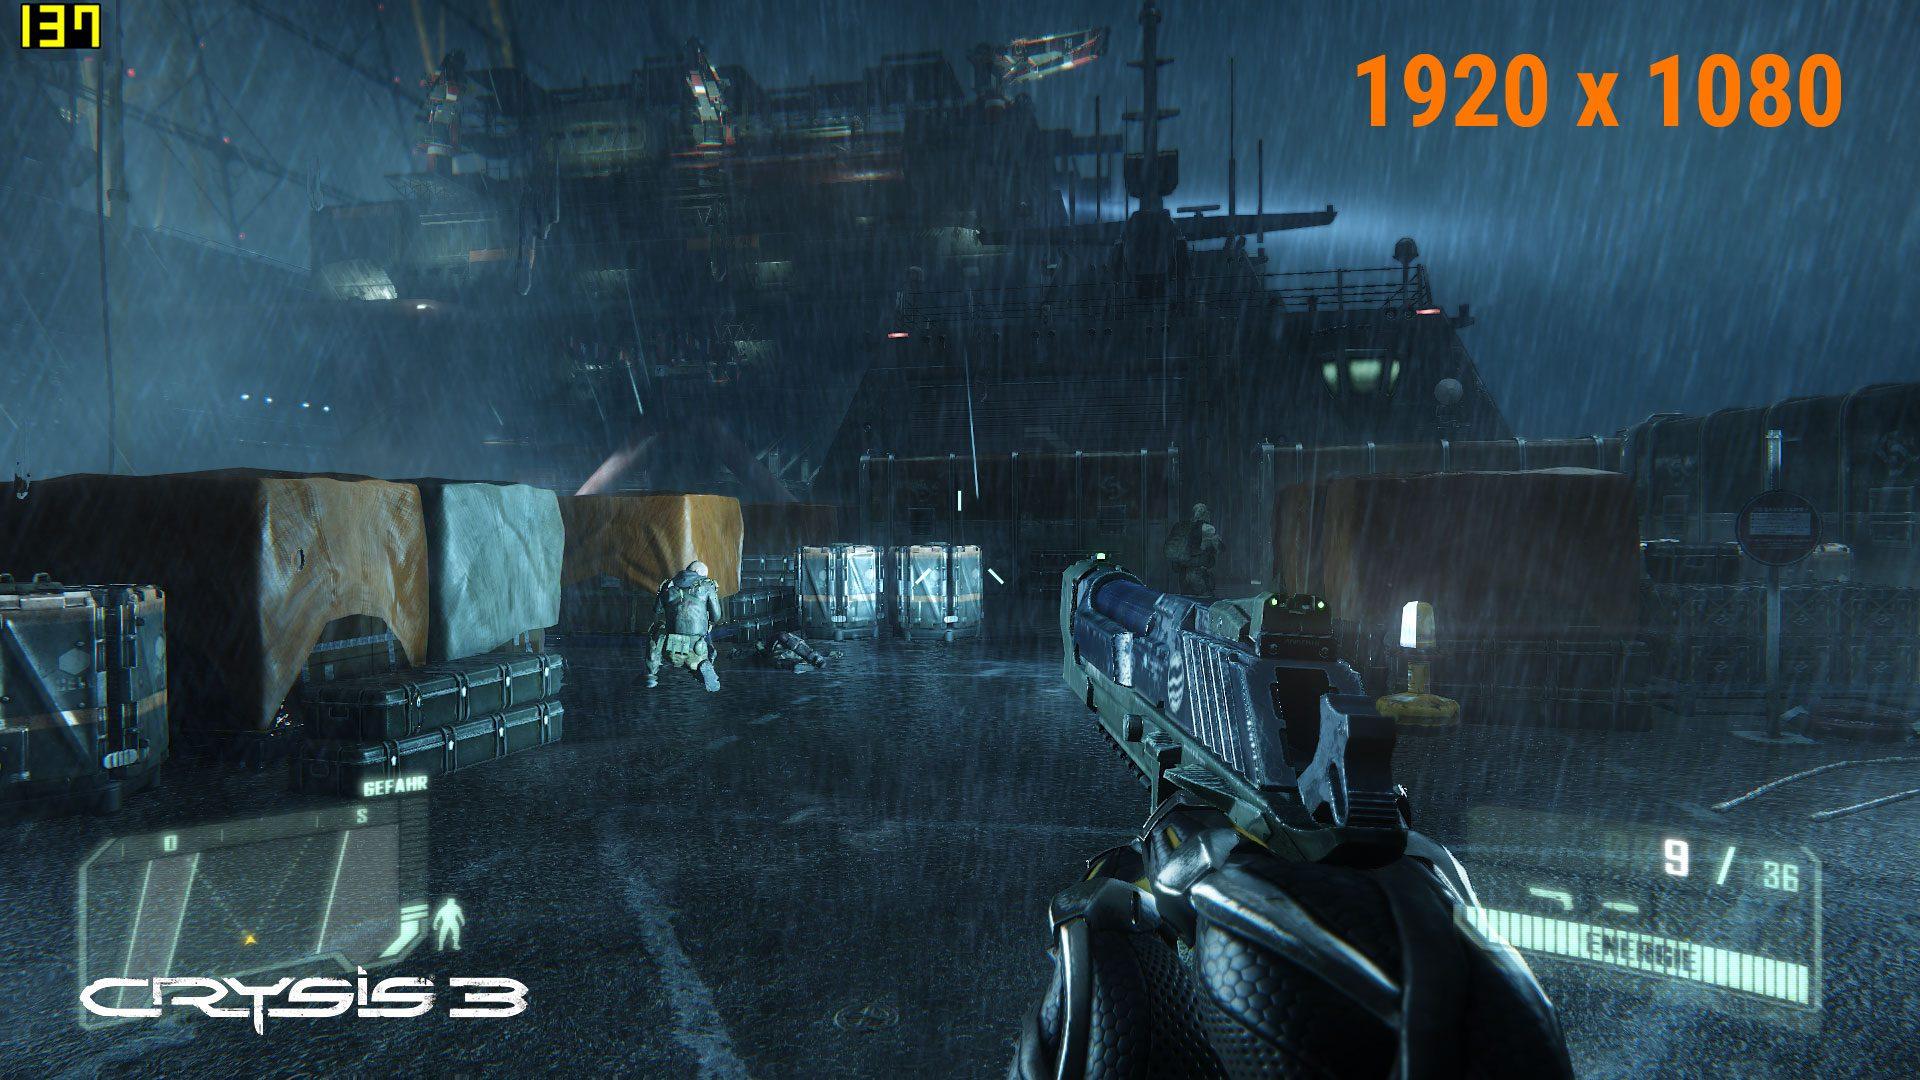 Acer-Predator-17-G9-793-718-Games-5